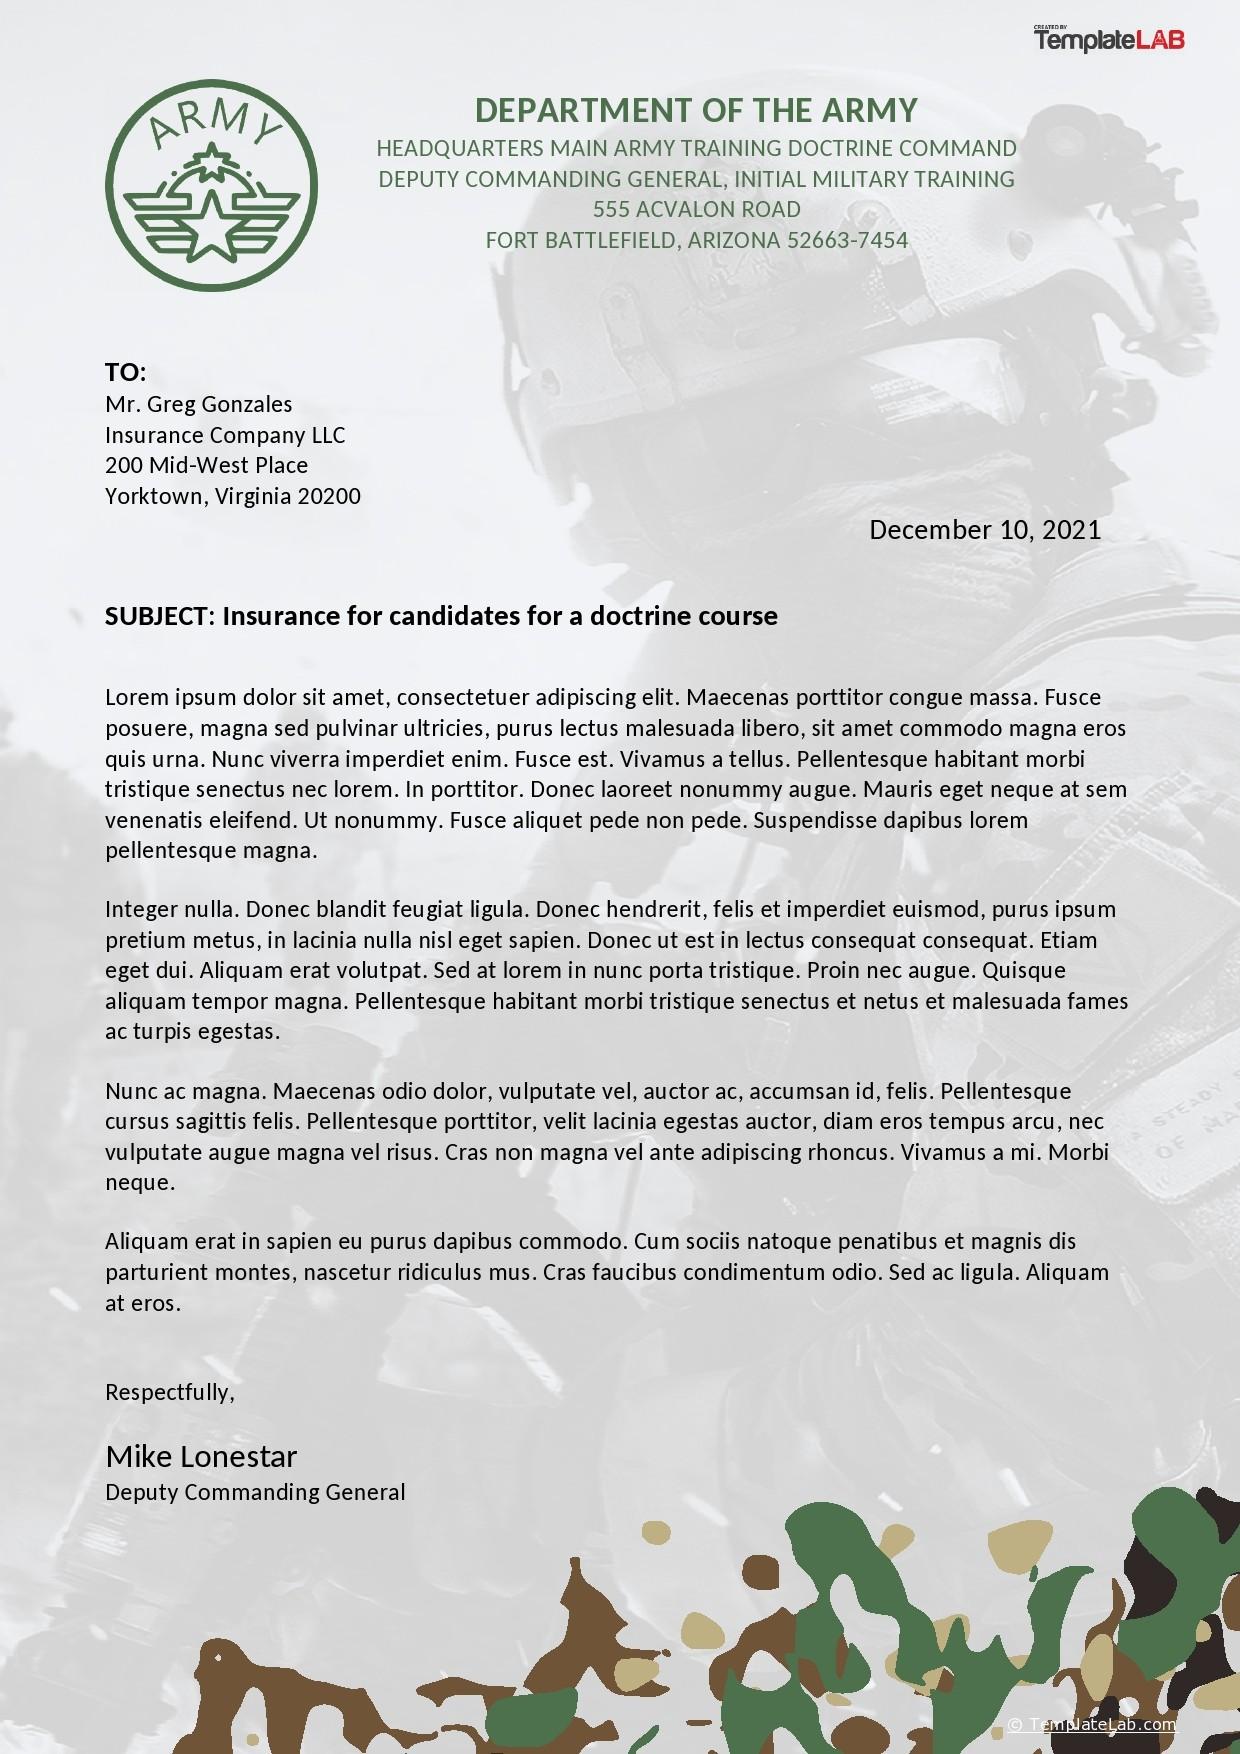 Free Army Letterhead Template - TemplateLab.com